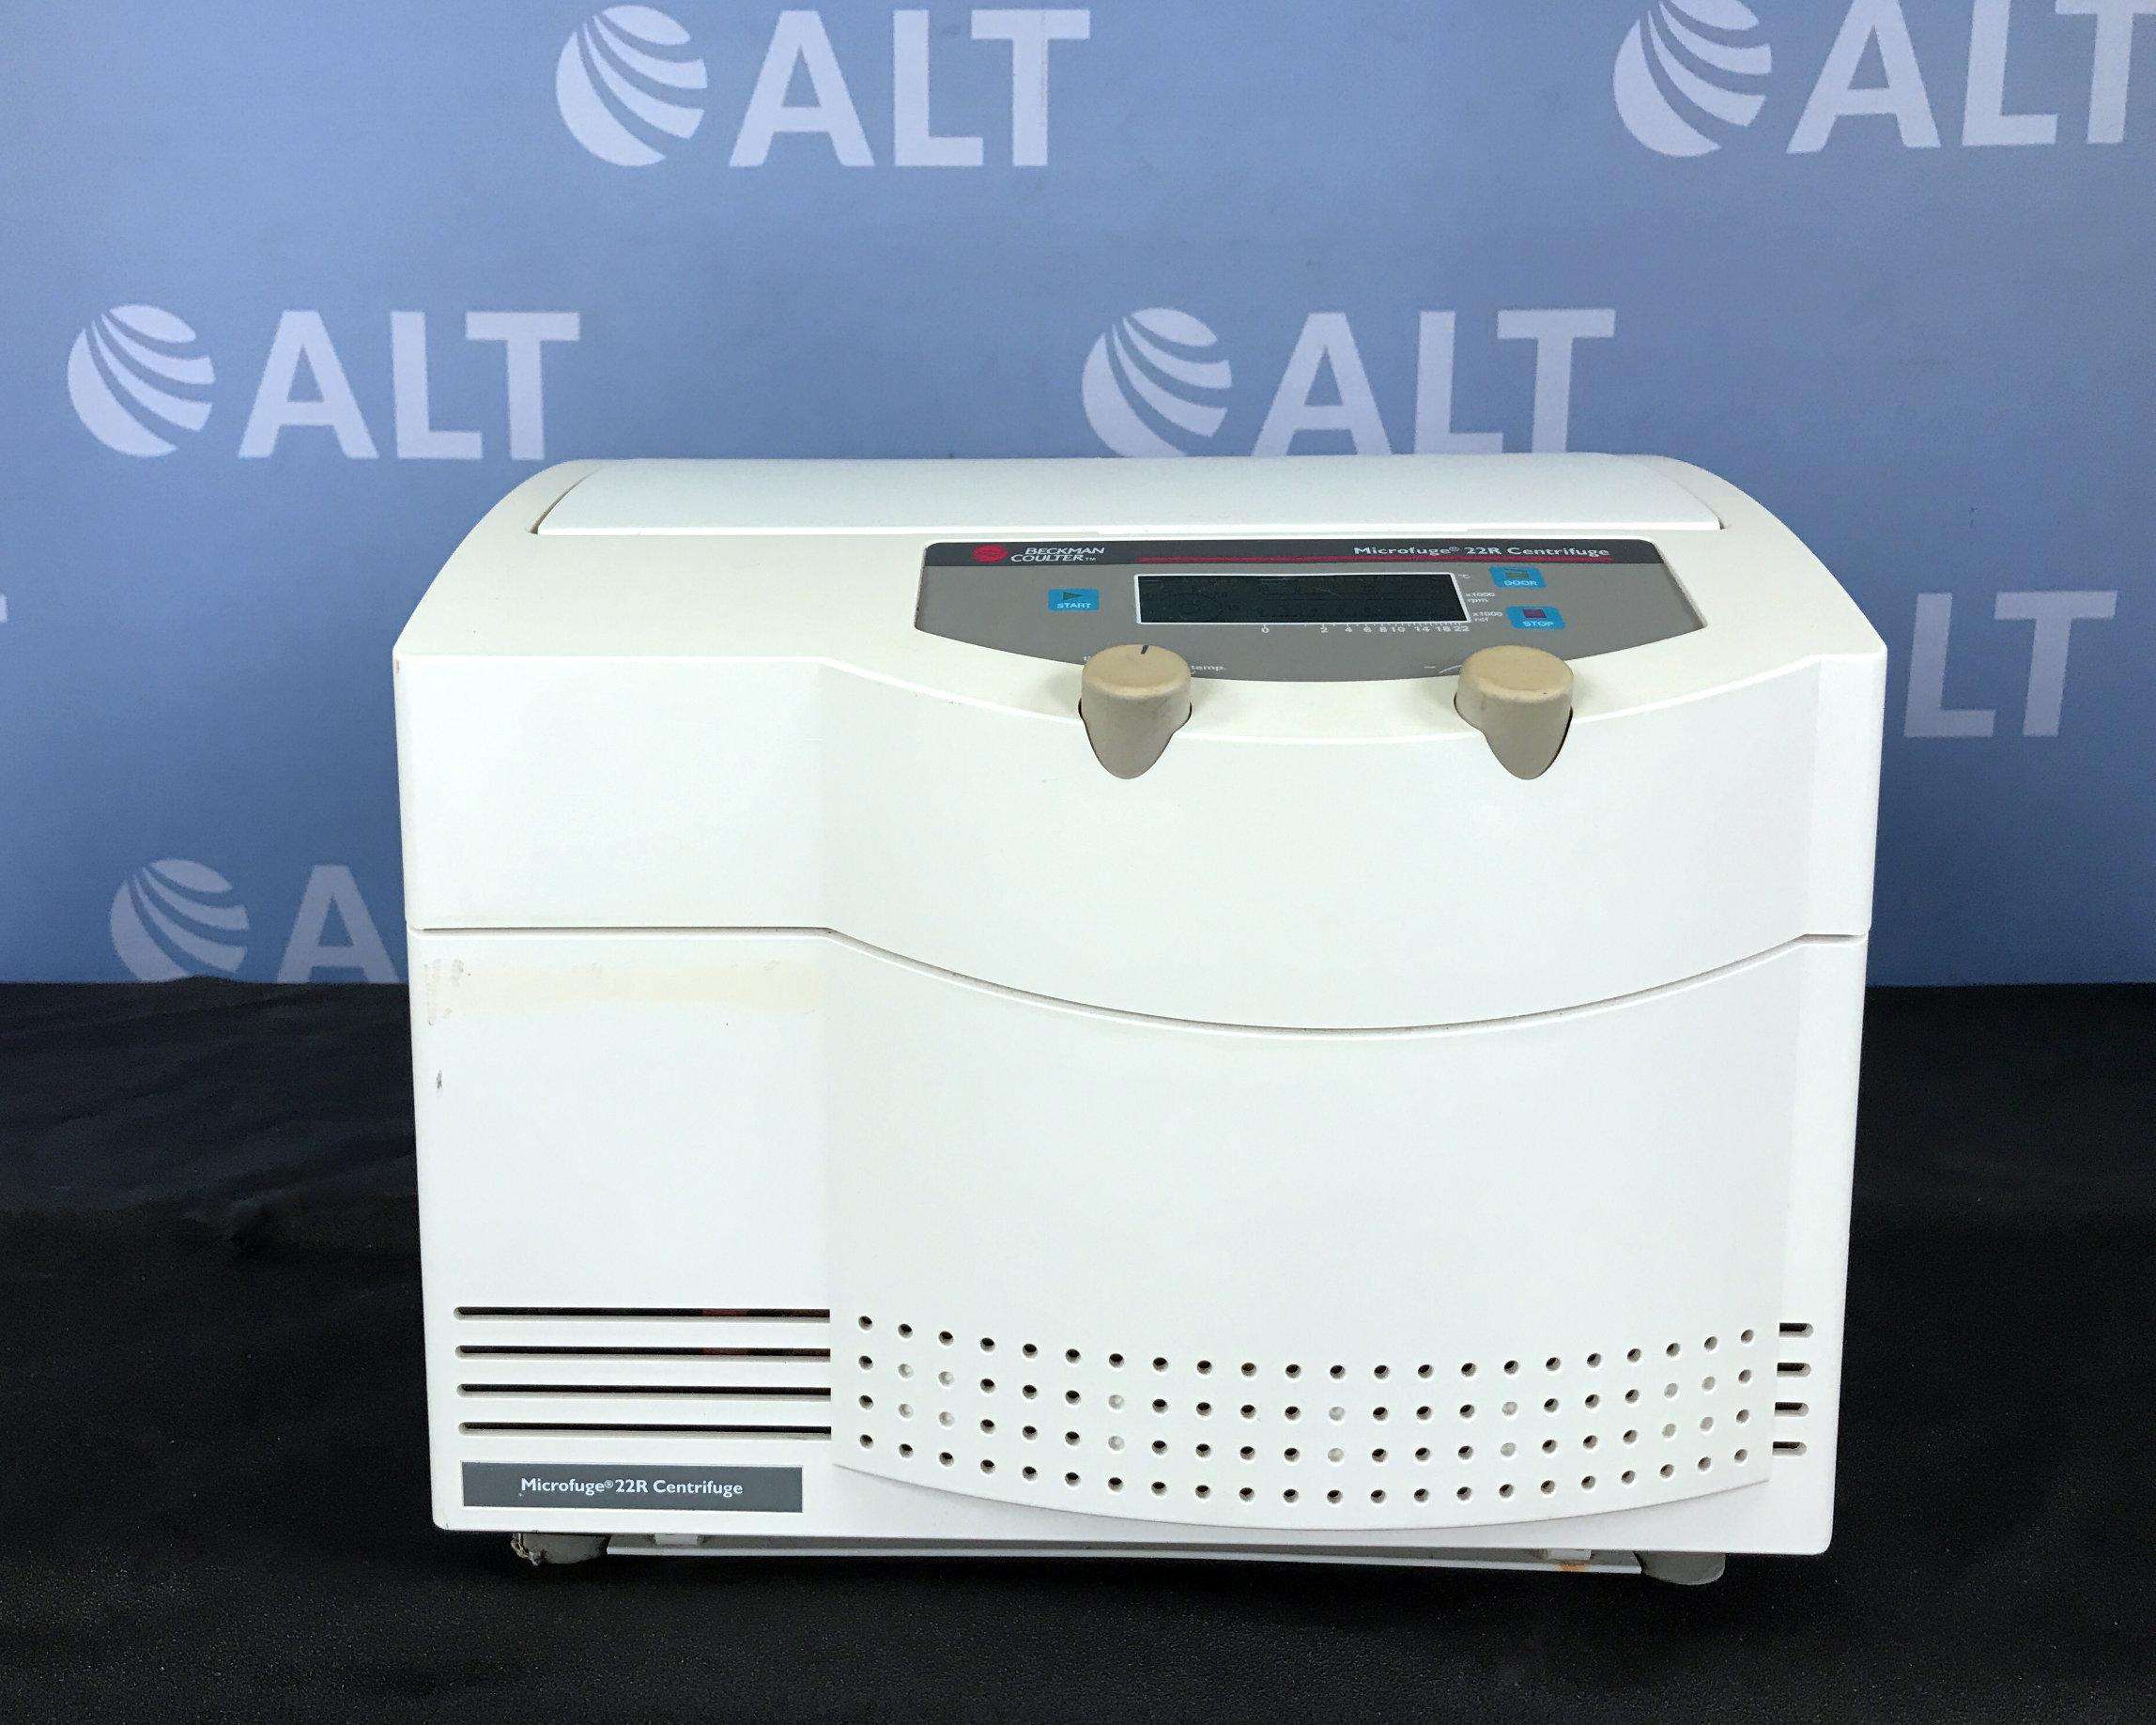 Beckman Coulter Microfuge 22R Refrigerated Centrifuge Image